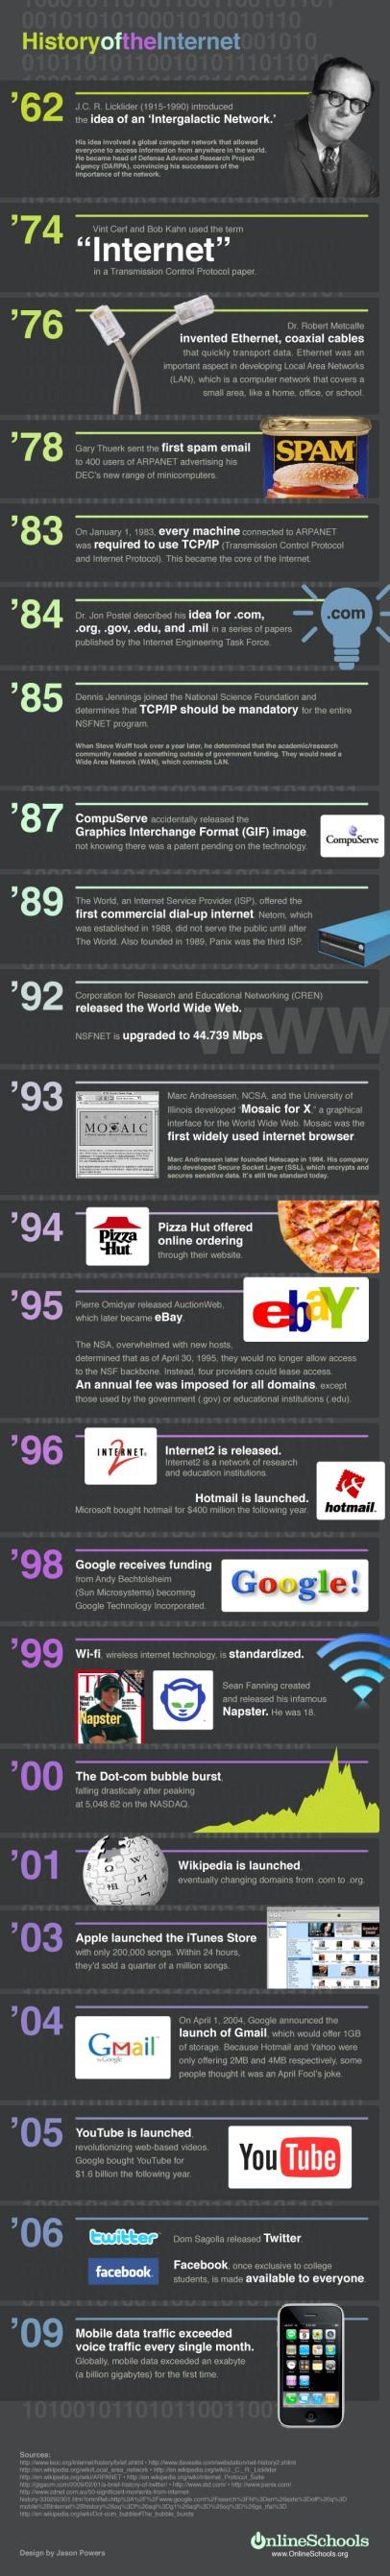 Internet-Geschichte 62-09